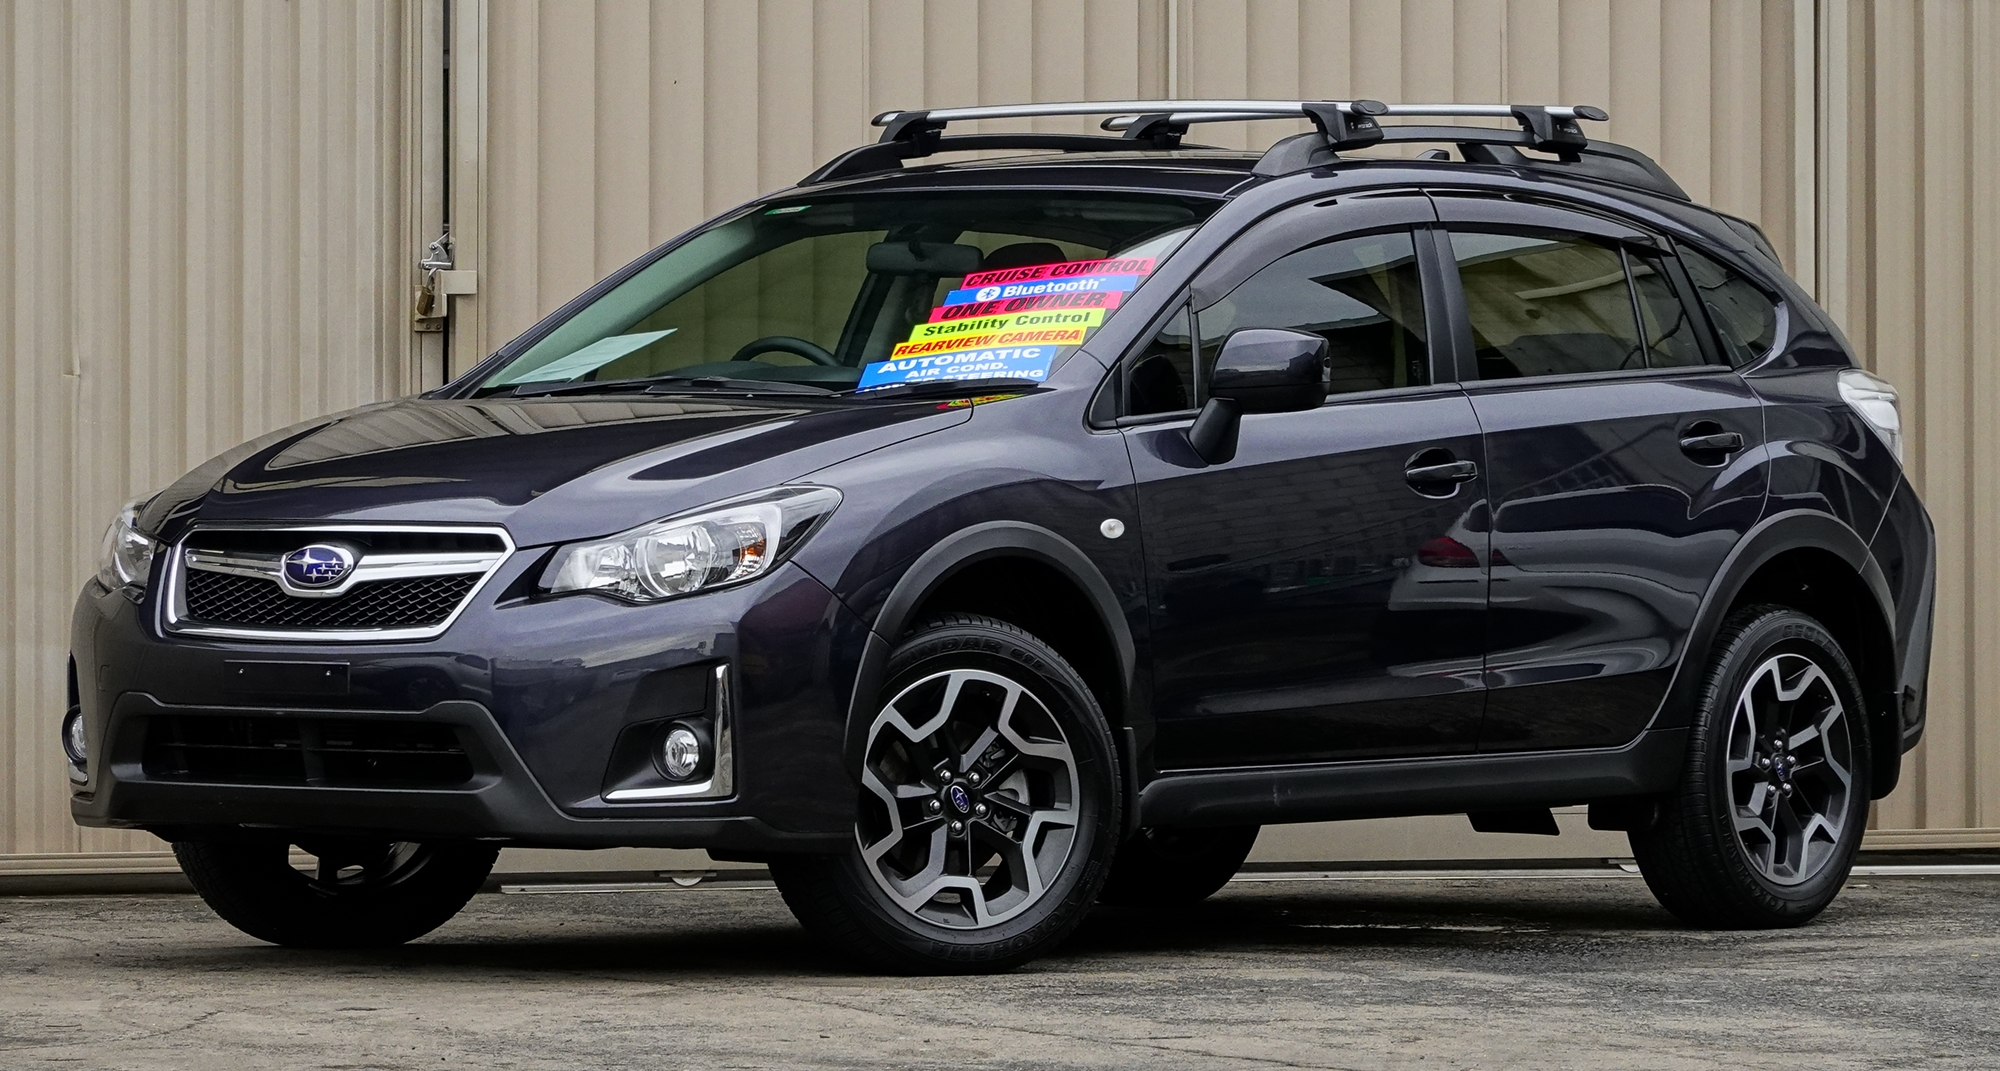 https://jontomcarsales.dealercms.jcs.com.au/vehicle/2015-toyota-yaris-5dhatchback-sx-ncp131rmy15-192305#